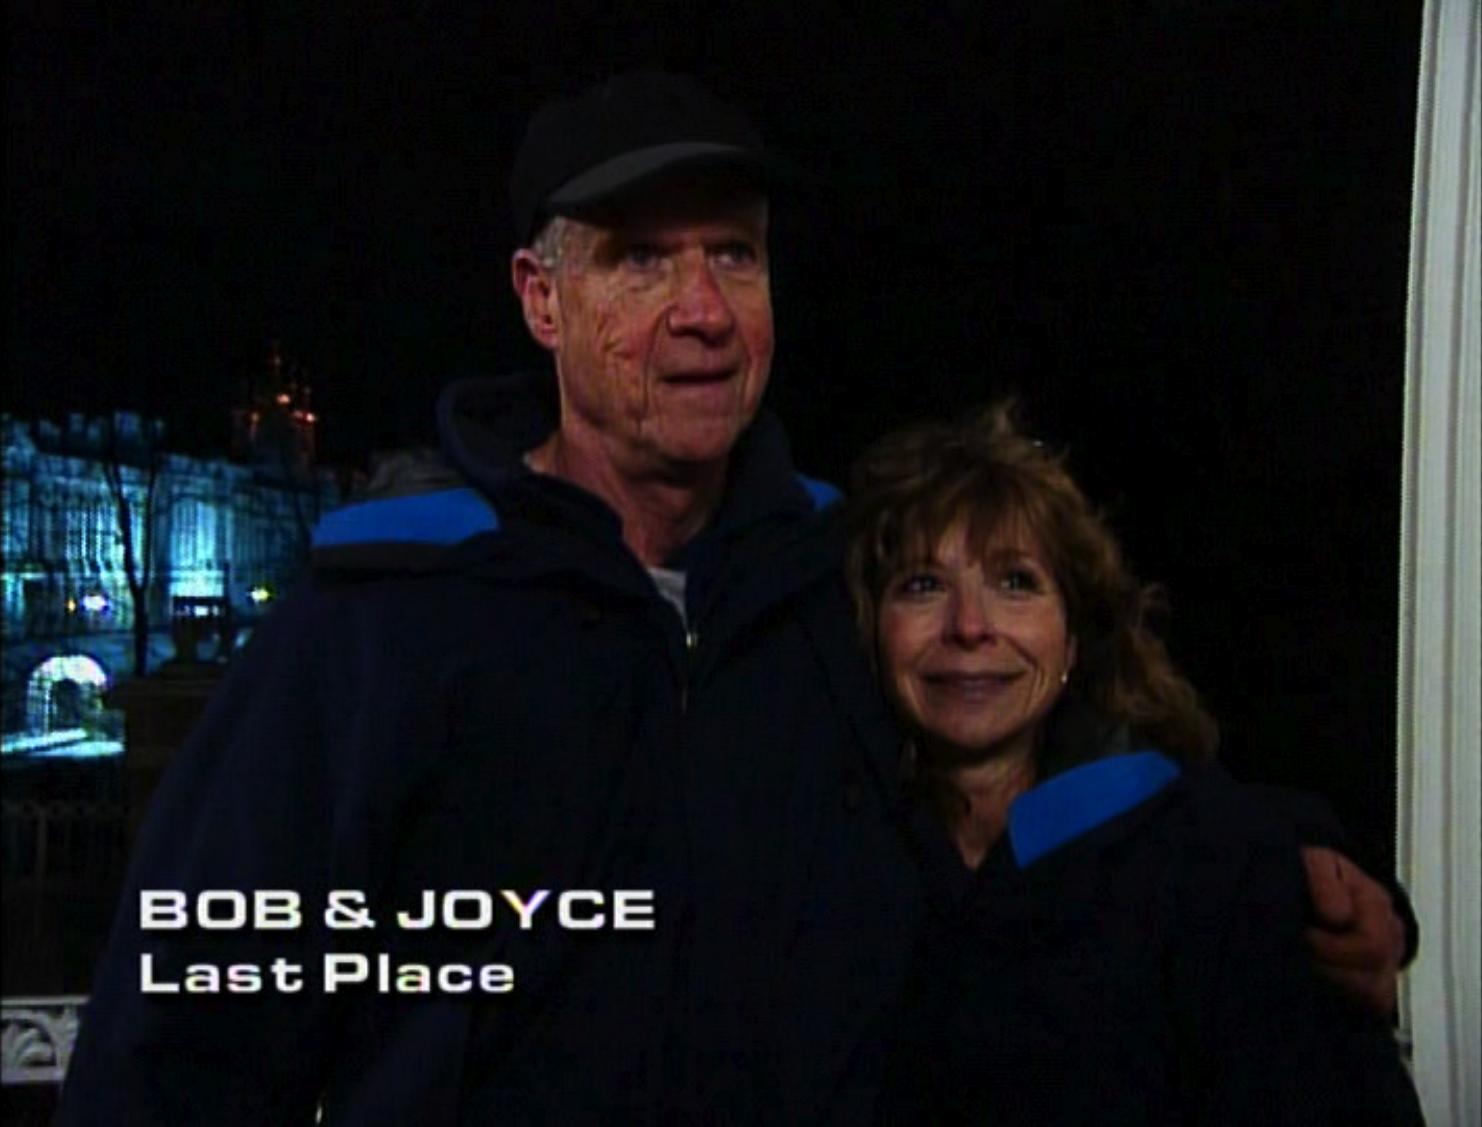 Bob & Joyce/Gallery